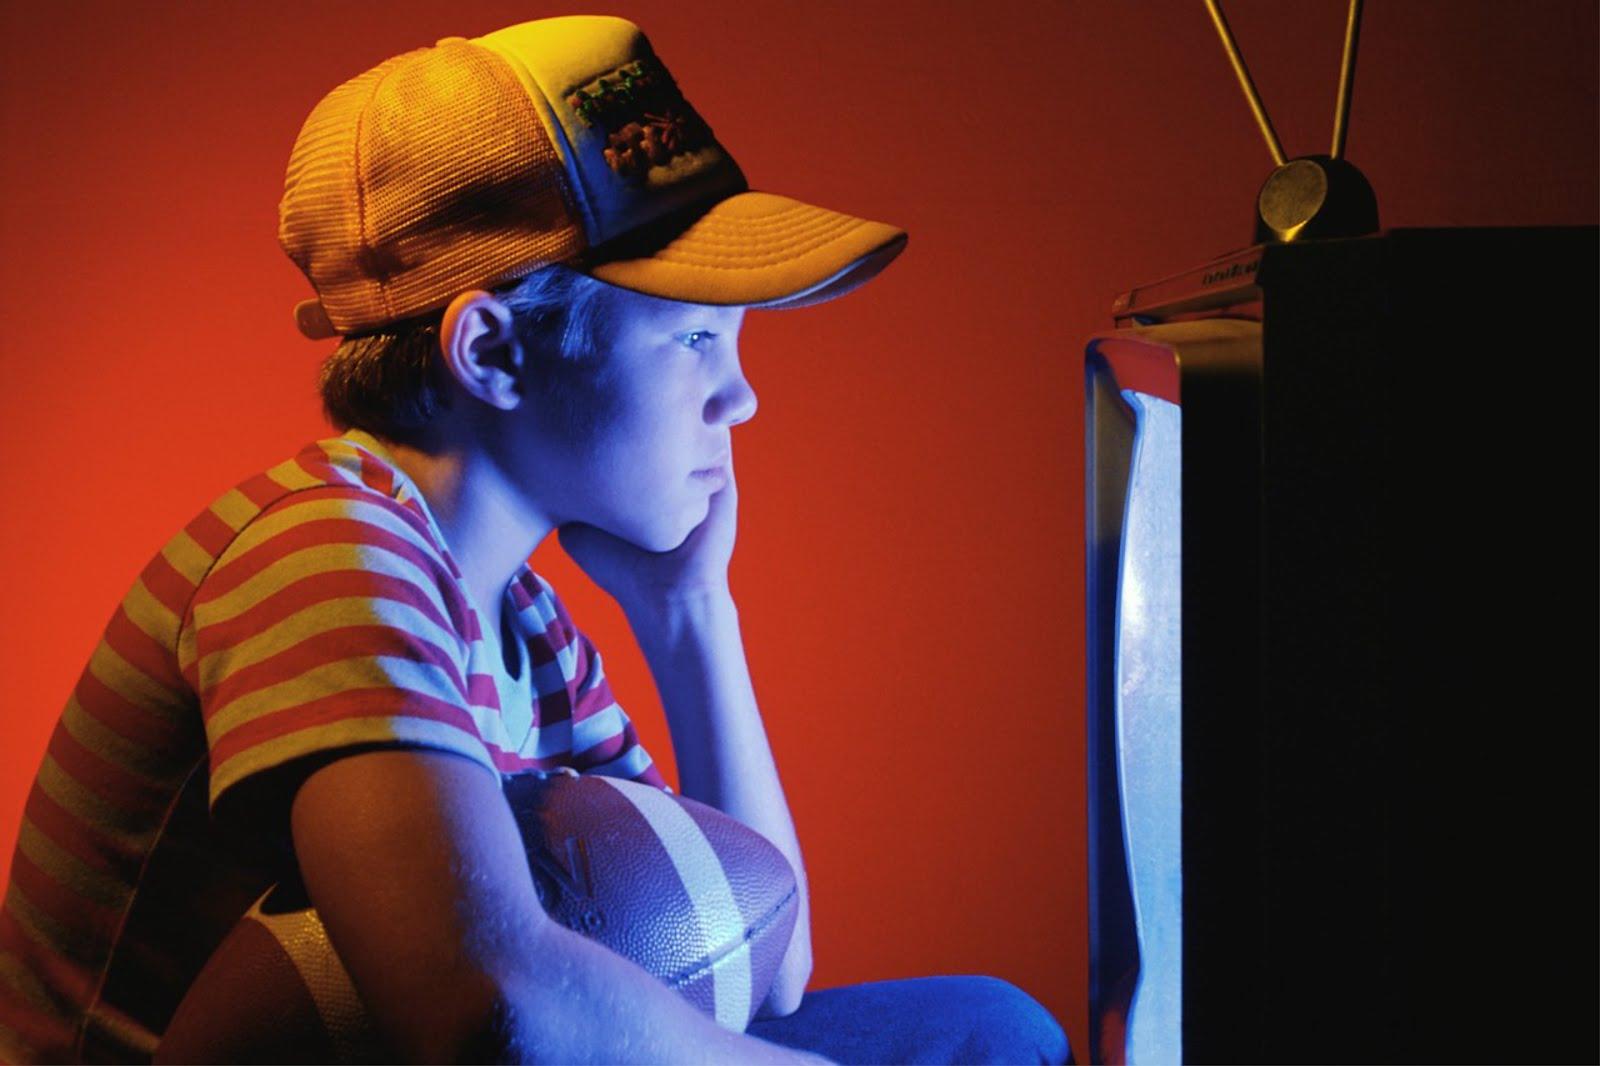 Boy up close watching television.jpg